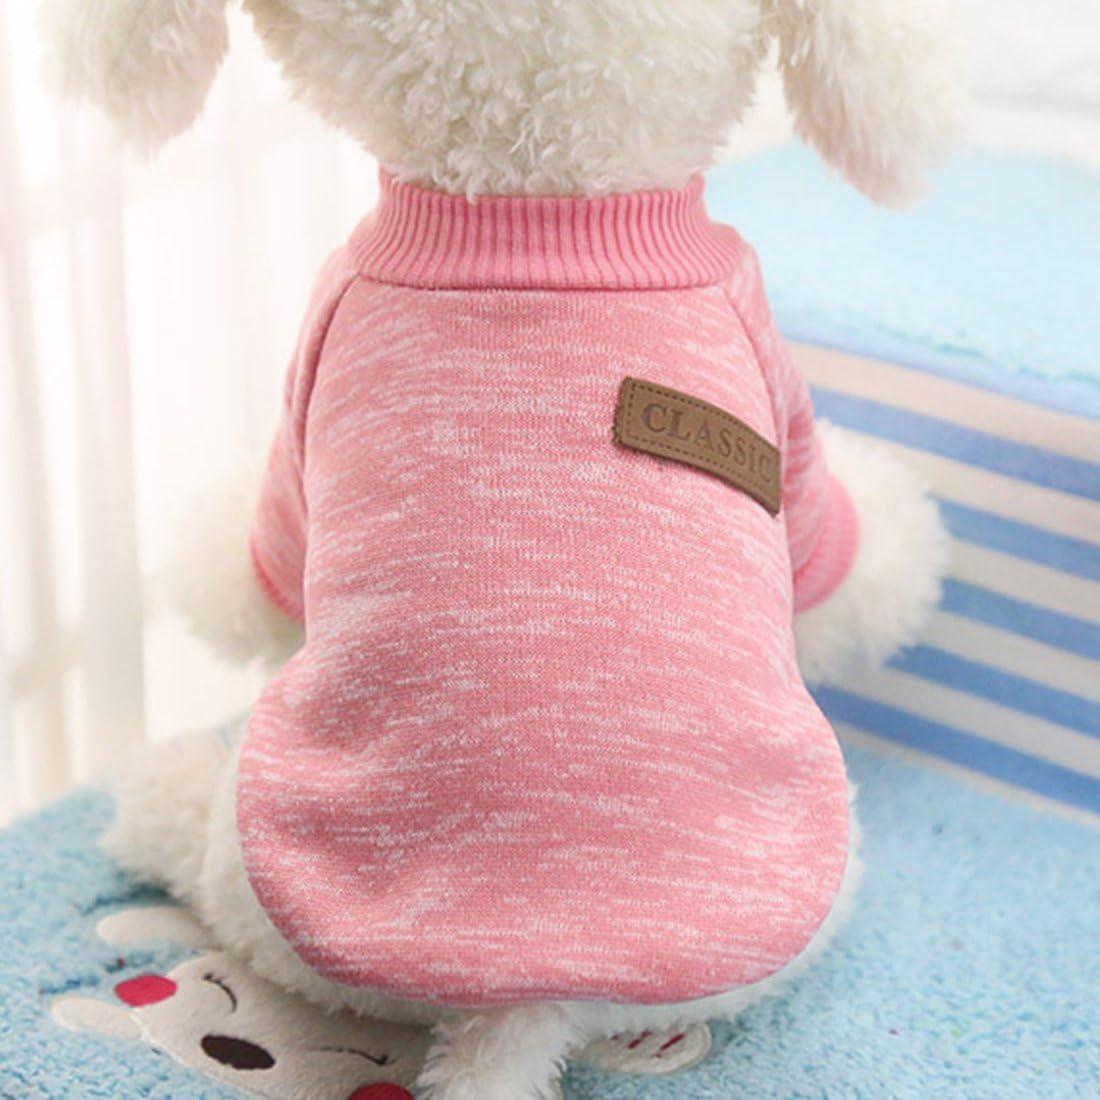 Idepet - Ropa para mascotas: jersey de forro polar para perros y gatos, L, Rosa